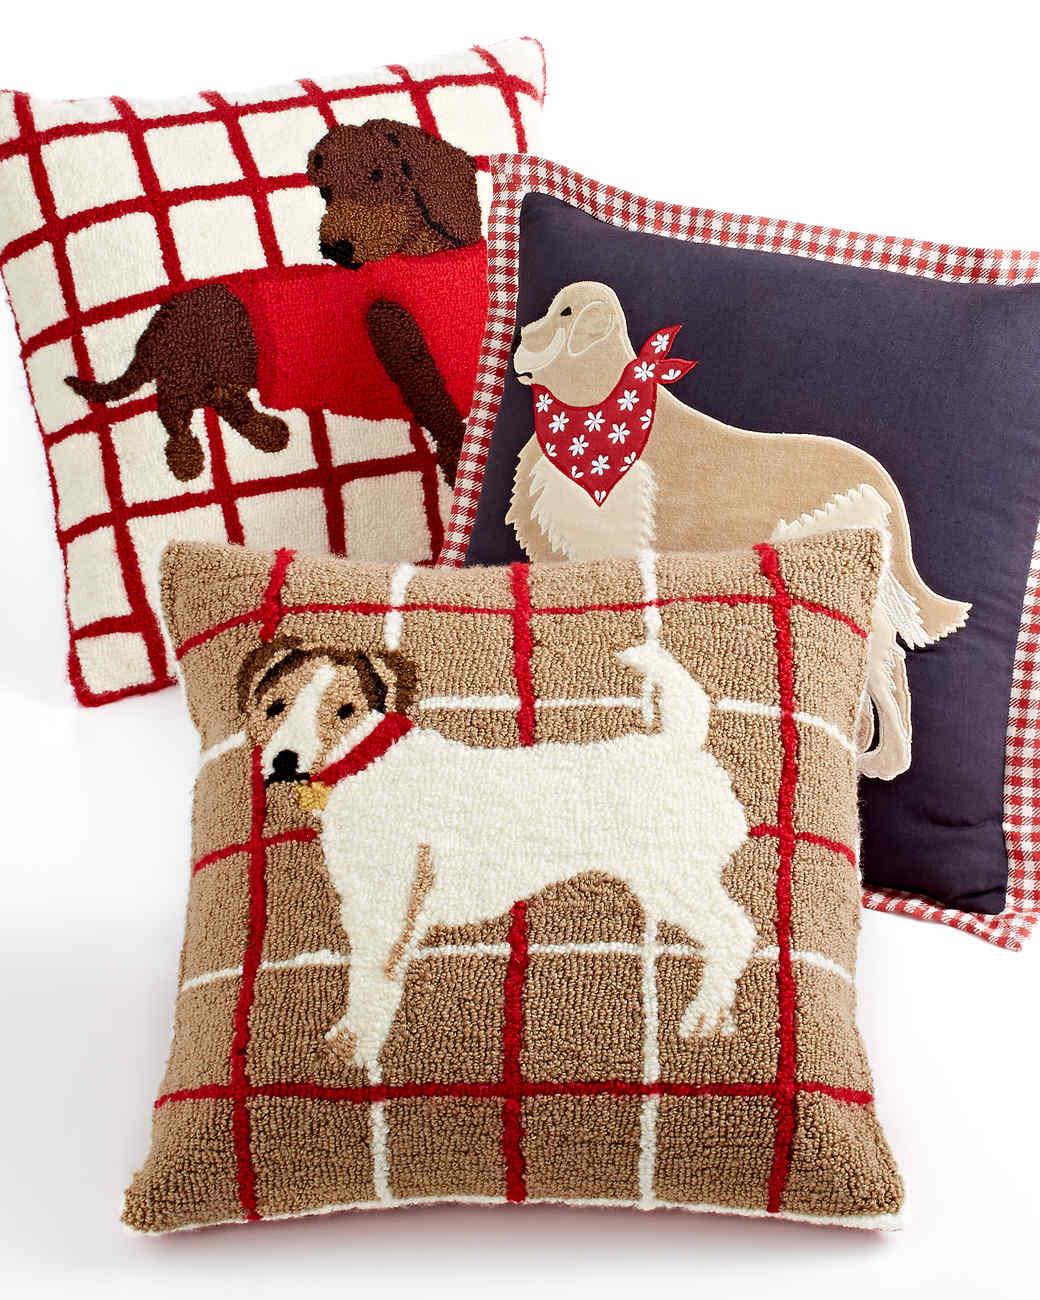 msmacys-holiday-decorativedogpillows-mrkt-1113.jpg